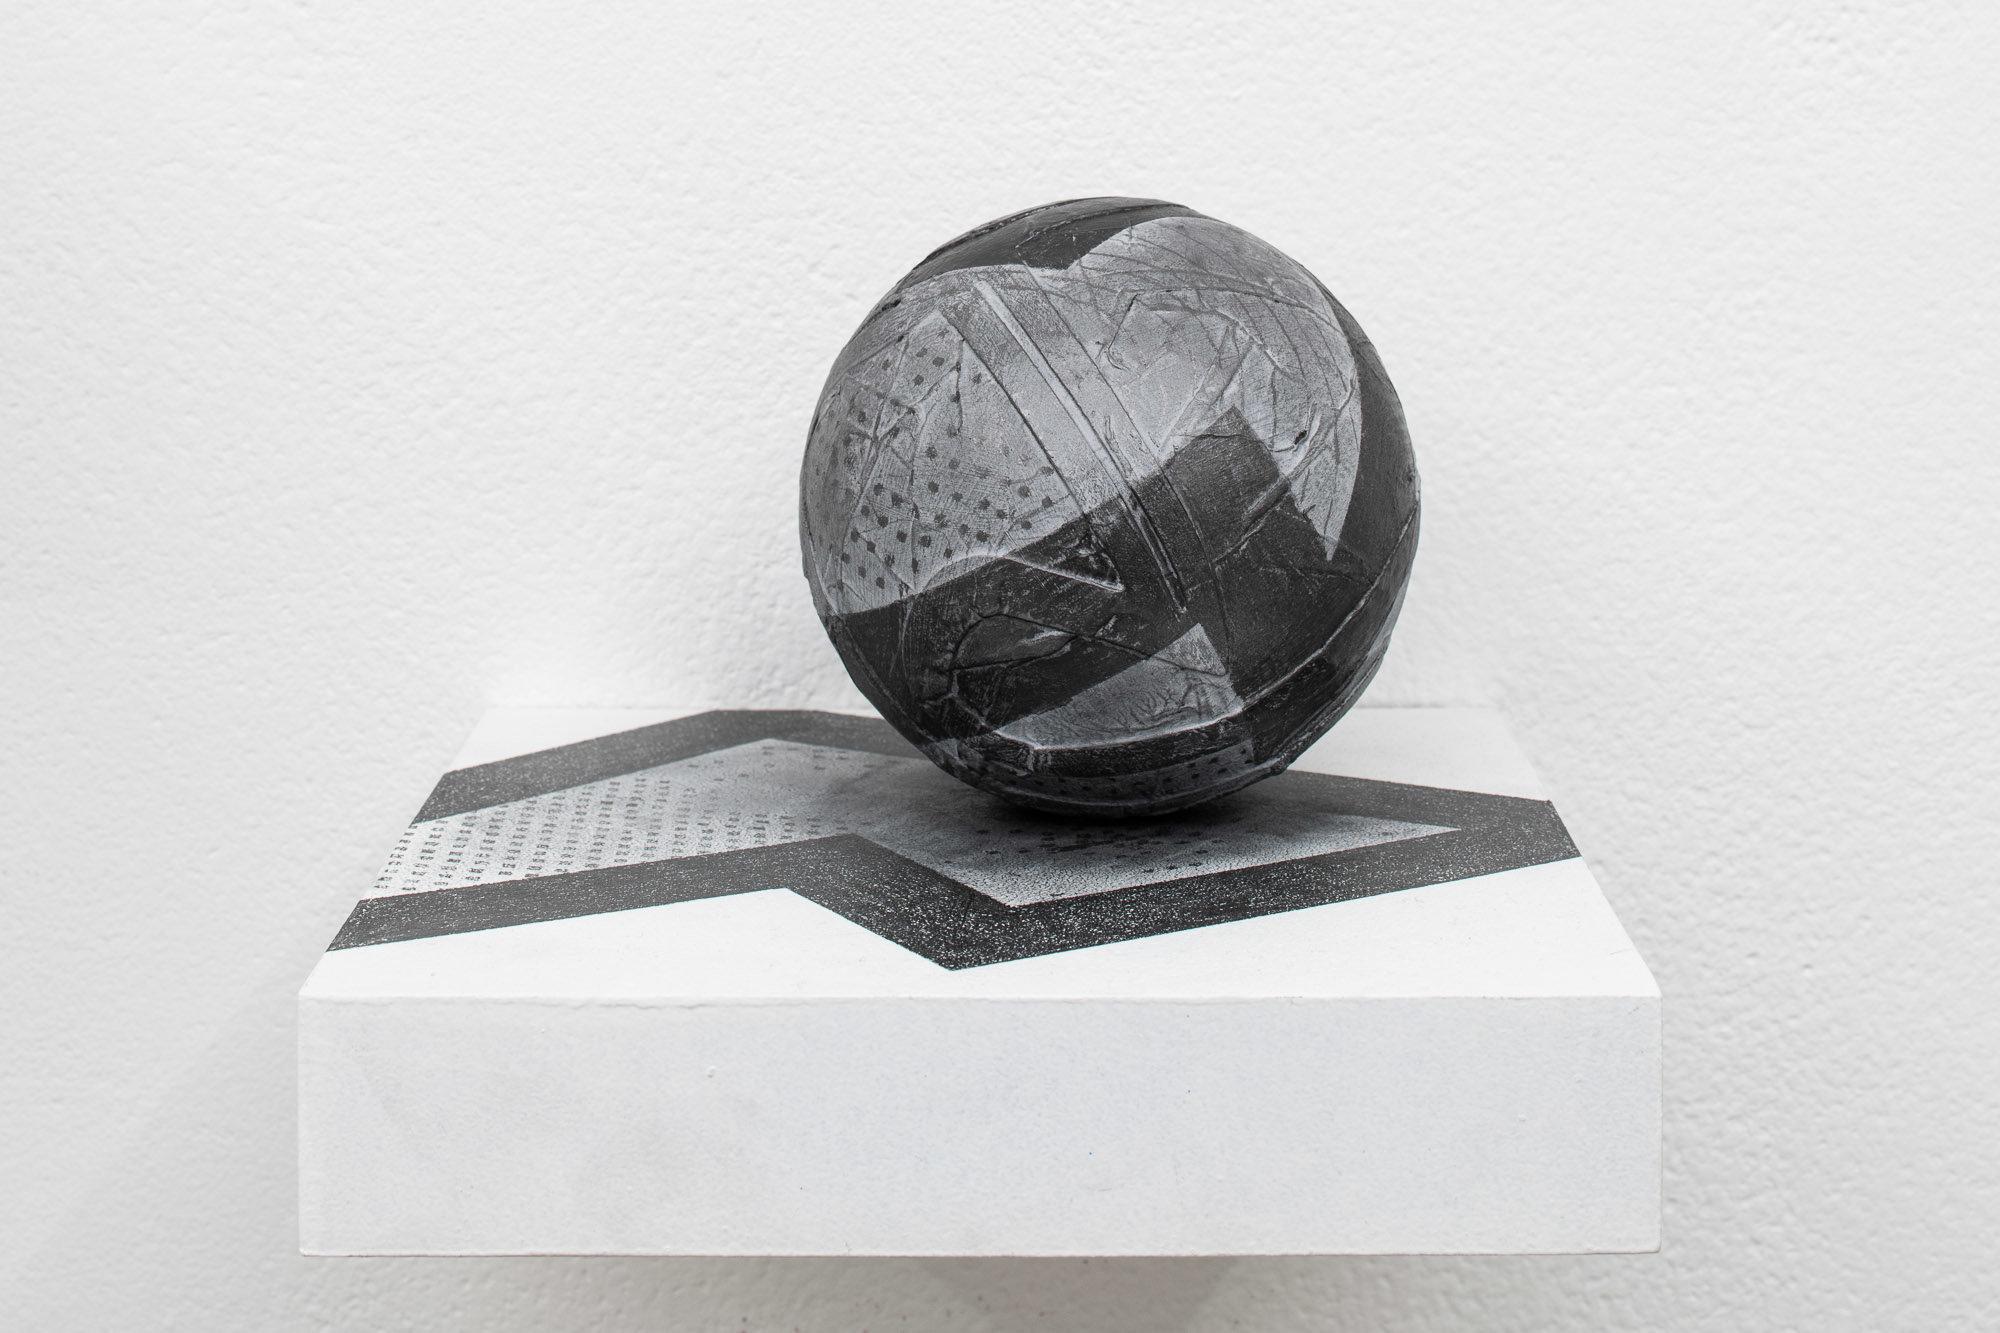 Residual #9 Pocket Globe